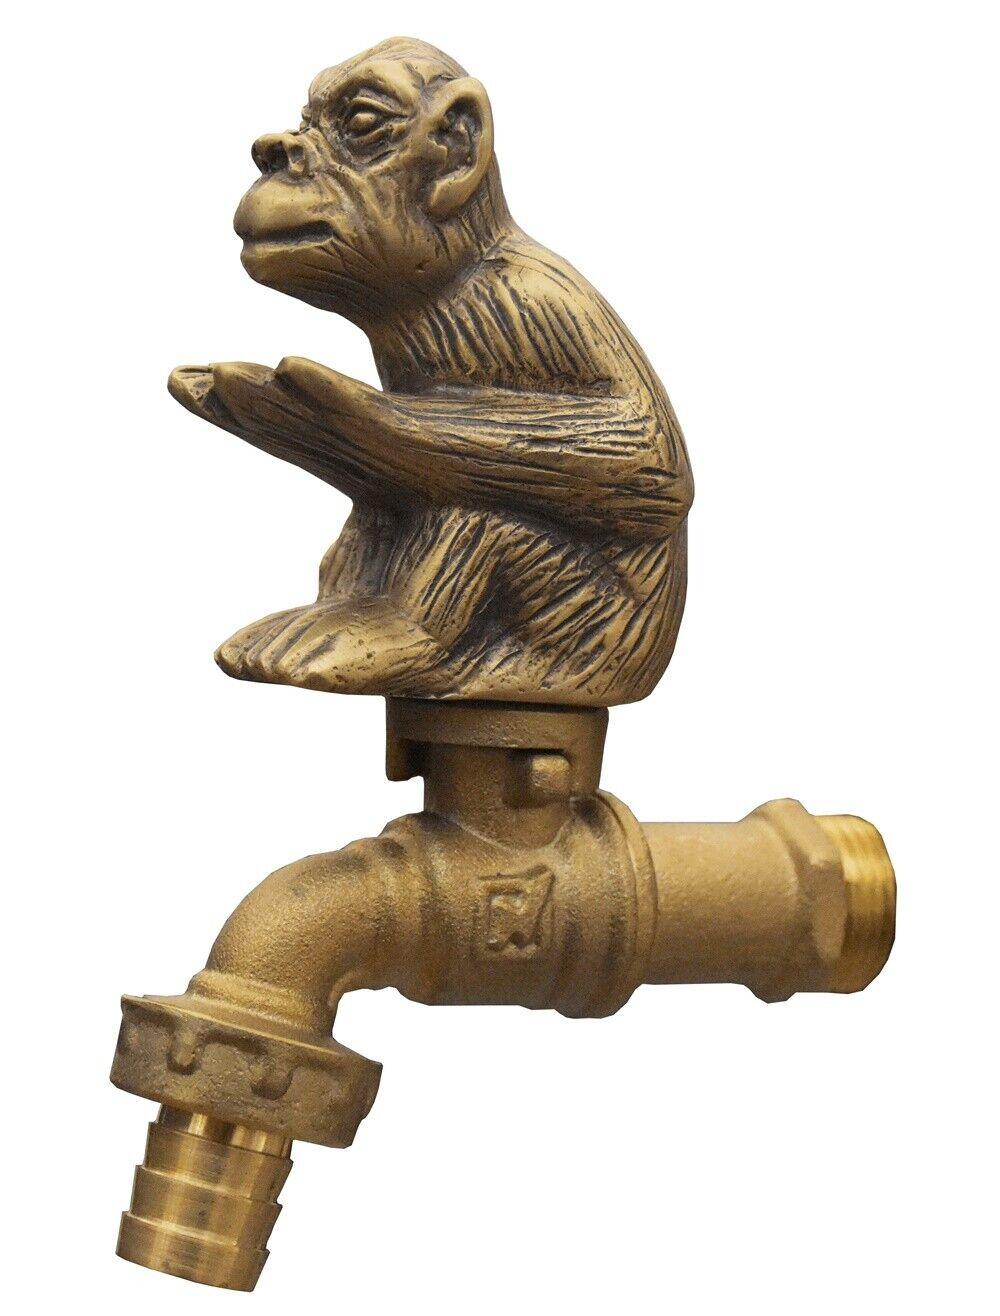 Brass Garden Faucet Tap Monkey Spigot Vintage Water Home Decor Outdoor Living